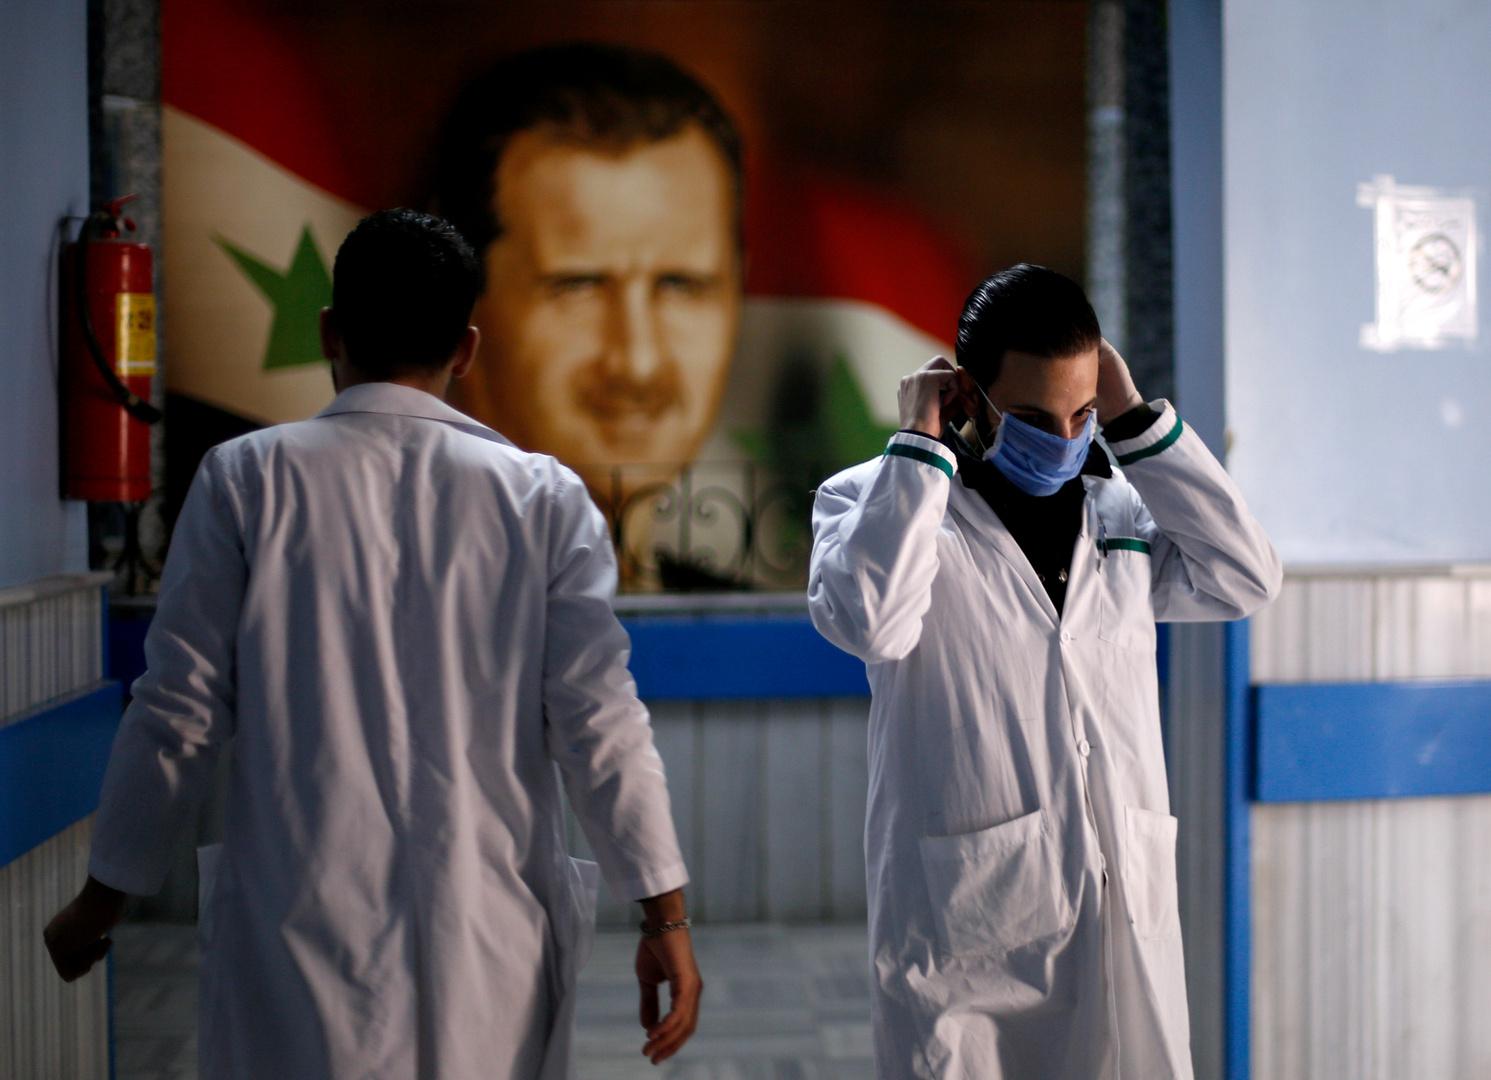 طبيب سوري يؤلف